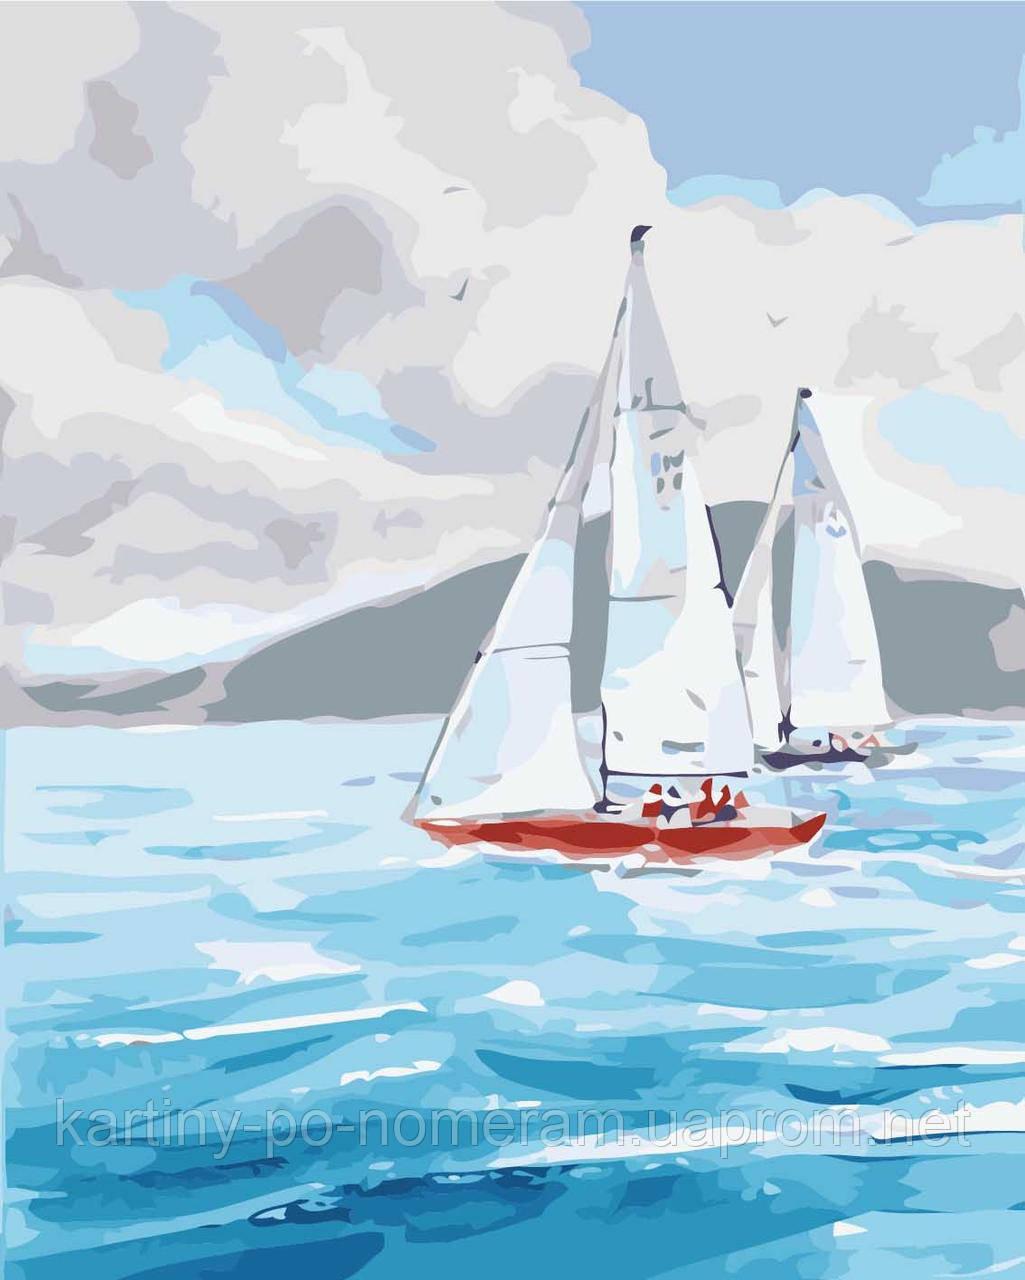 Картина по номерам KH2726 Ласковое море (40 х 50 см) Идейка